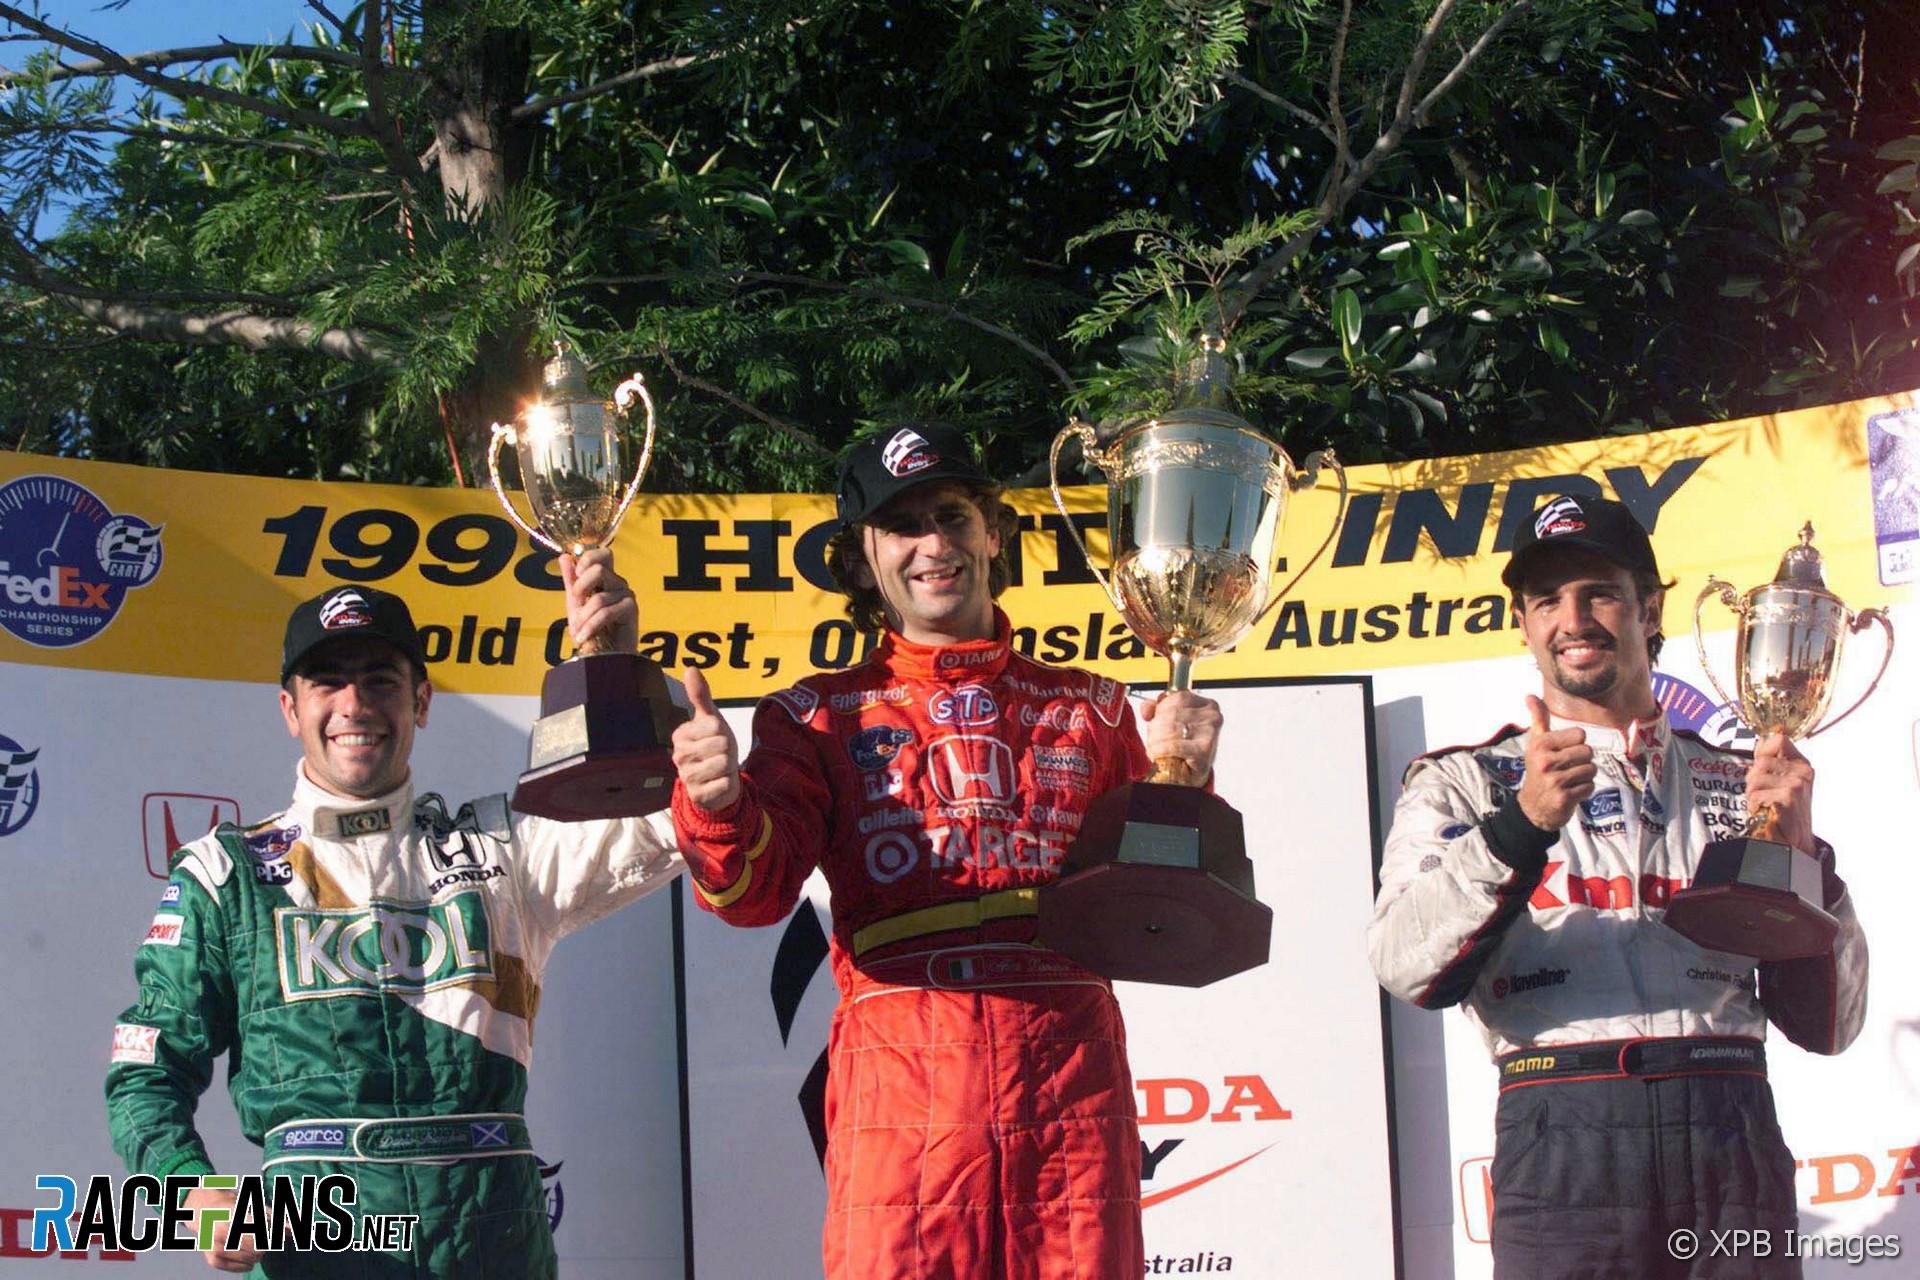 Alex Zanardi, Ganassi, IndyCar, Surfers Paradise, 1998